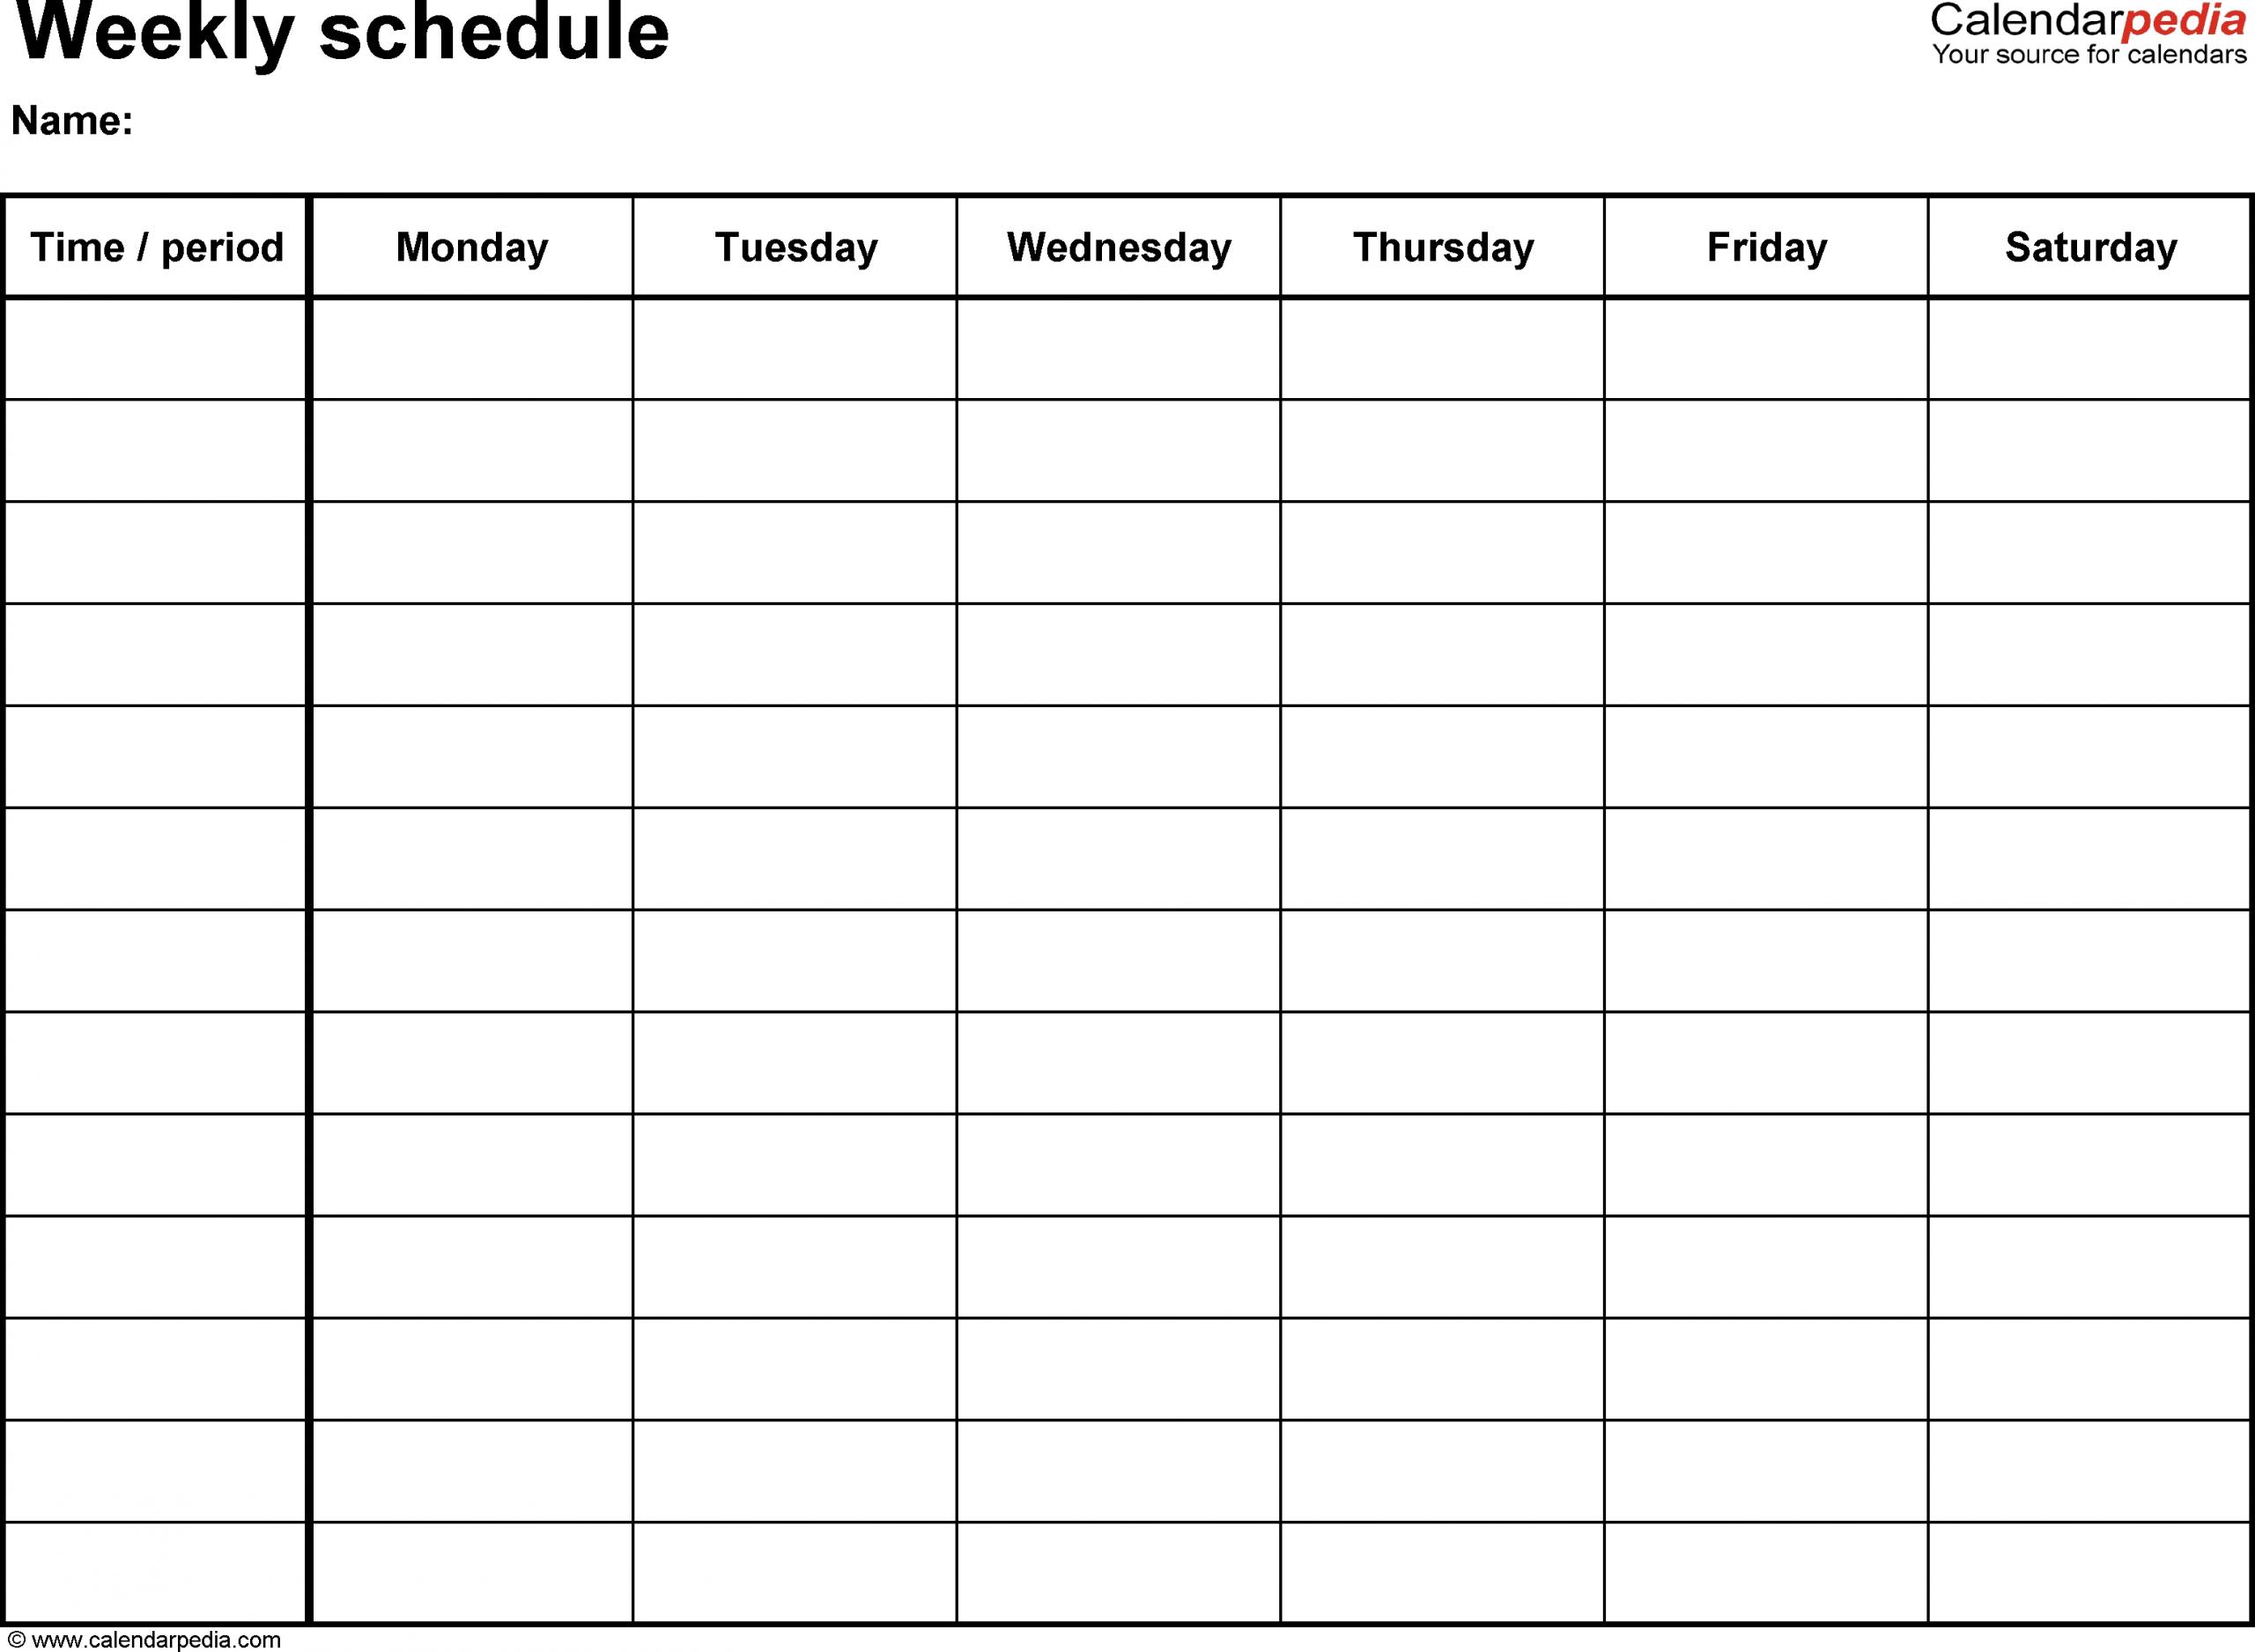 Blank Calendar Template Monday Friday - Calendar Calendar Template Monday To Friday